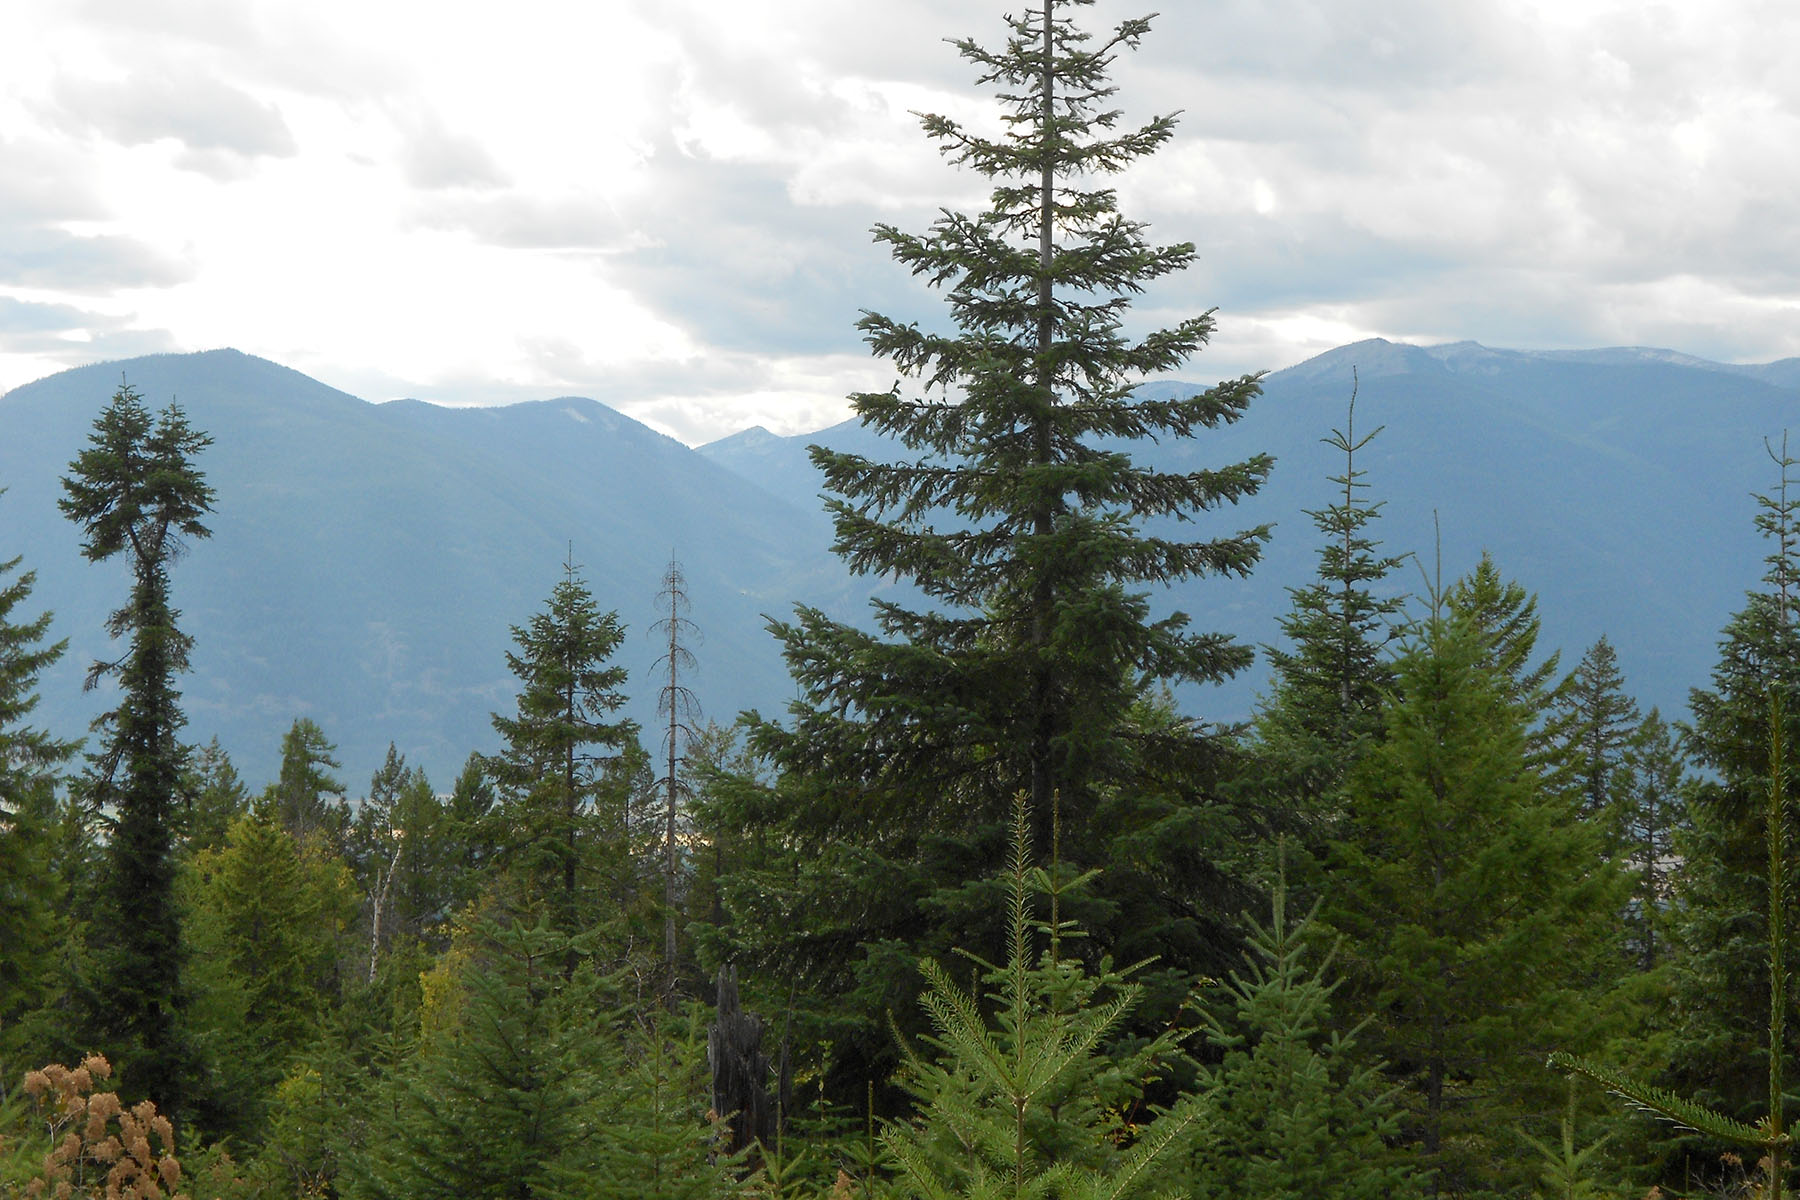 Земля для того Продажа на 40 Acres bordered 2 sides by Nat. Forest 40 ac. off Forest Service Rd 397 Bonners Ferry, Айдахо 83805 Соединенные Штаты